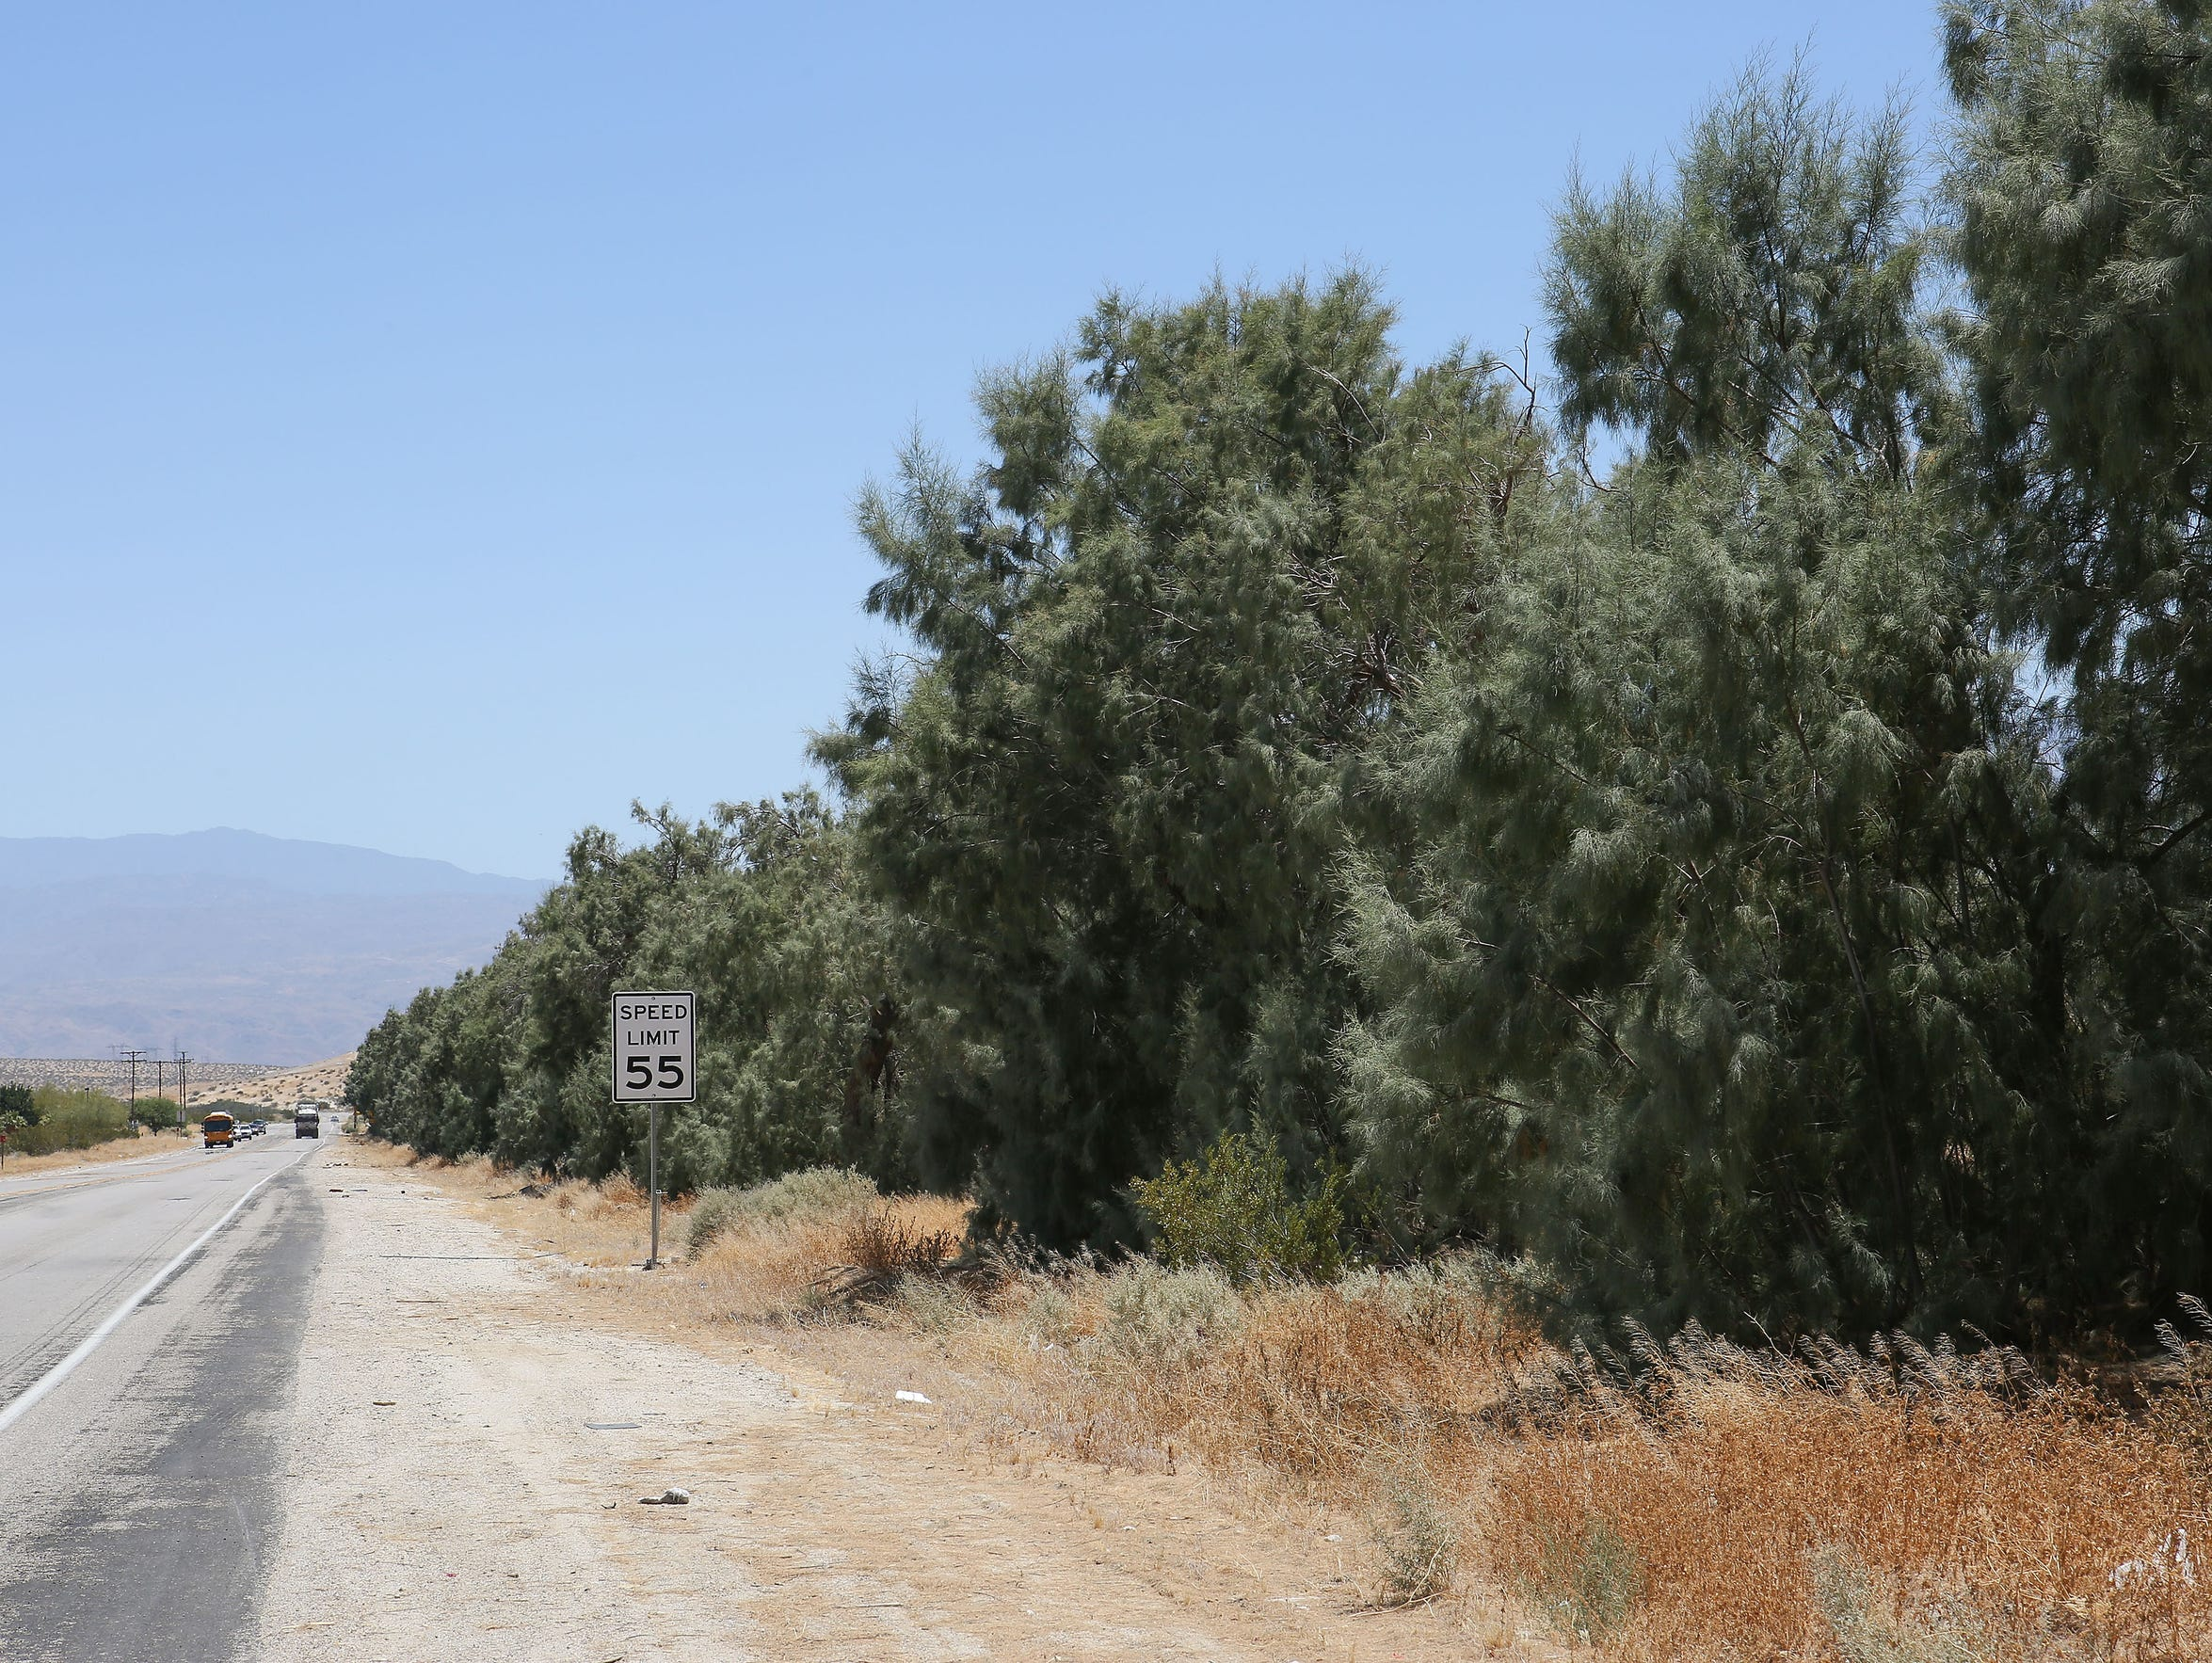 A row of tamarisk trees line a street in Desert Hot